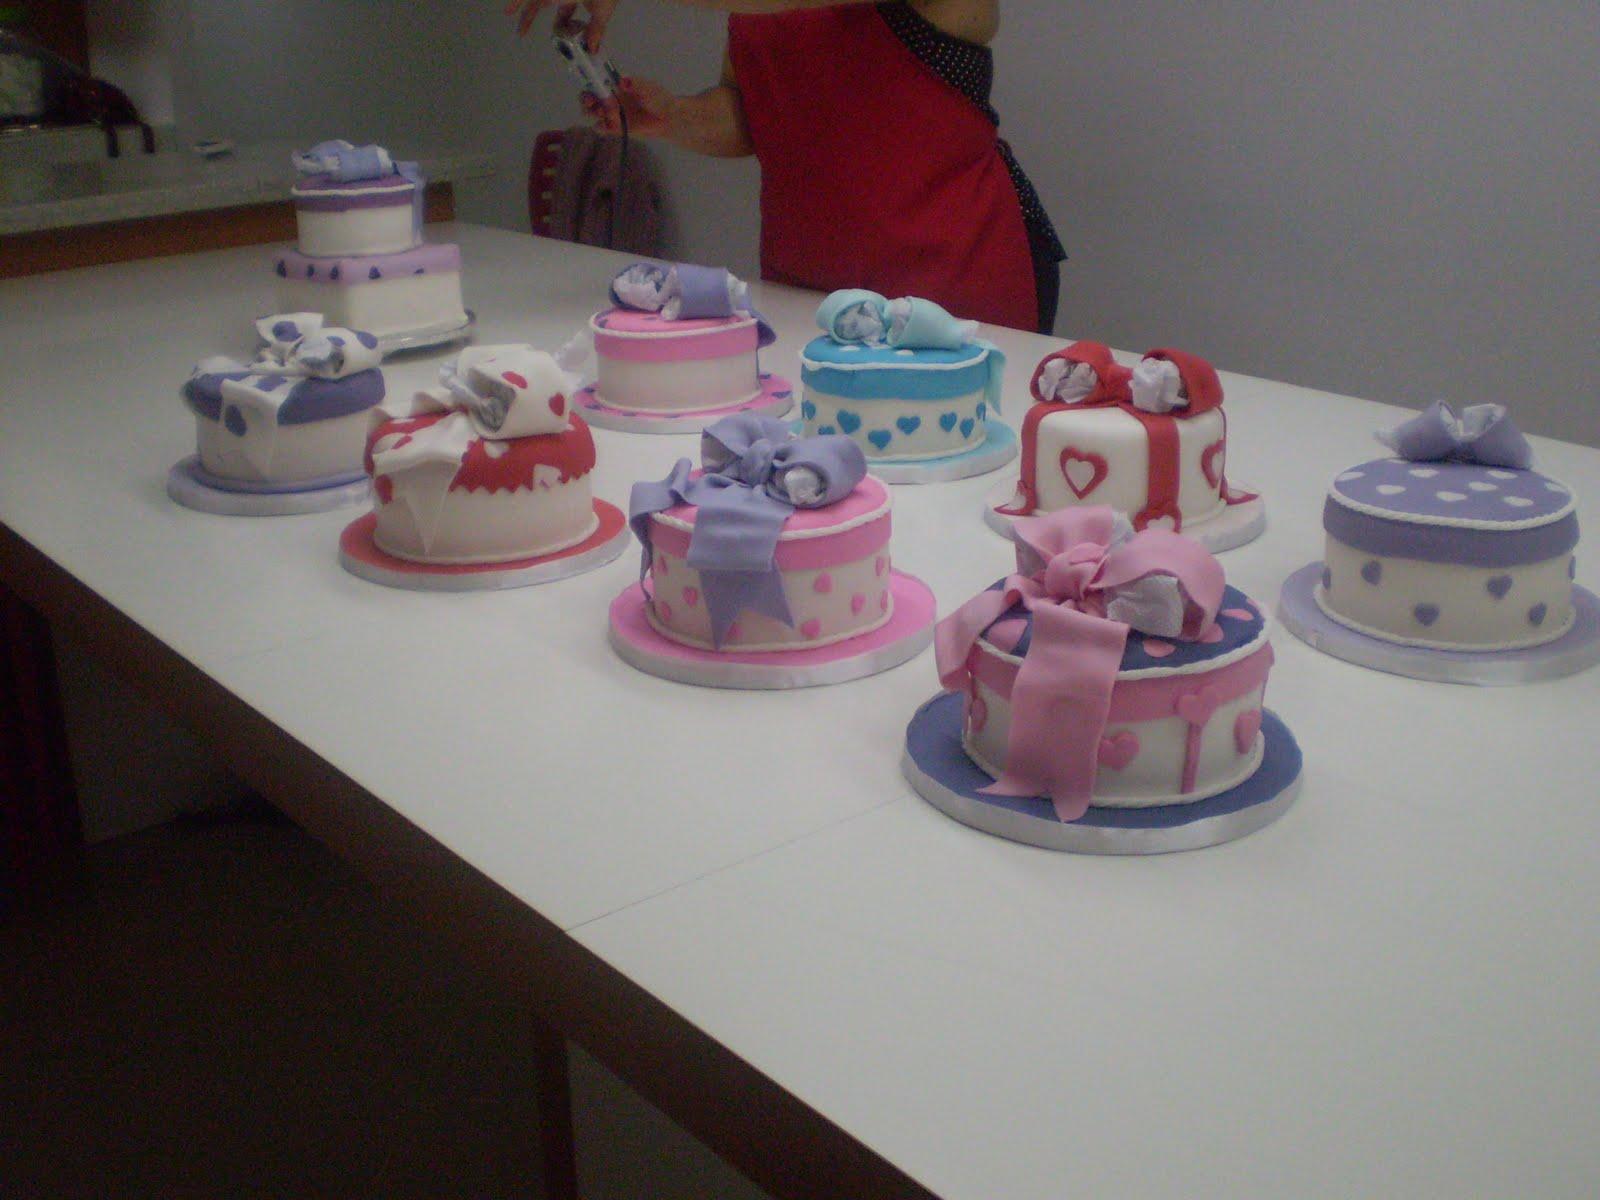 Curso De Cake Design Viseu : Cake Decor: Bolo caixa de presente